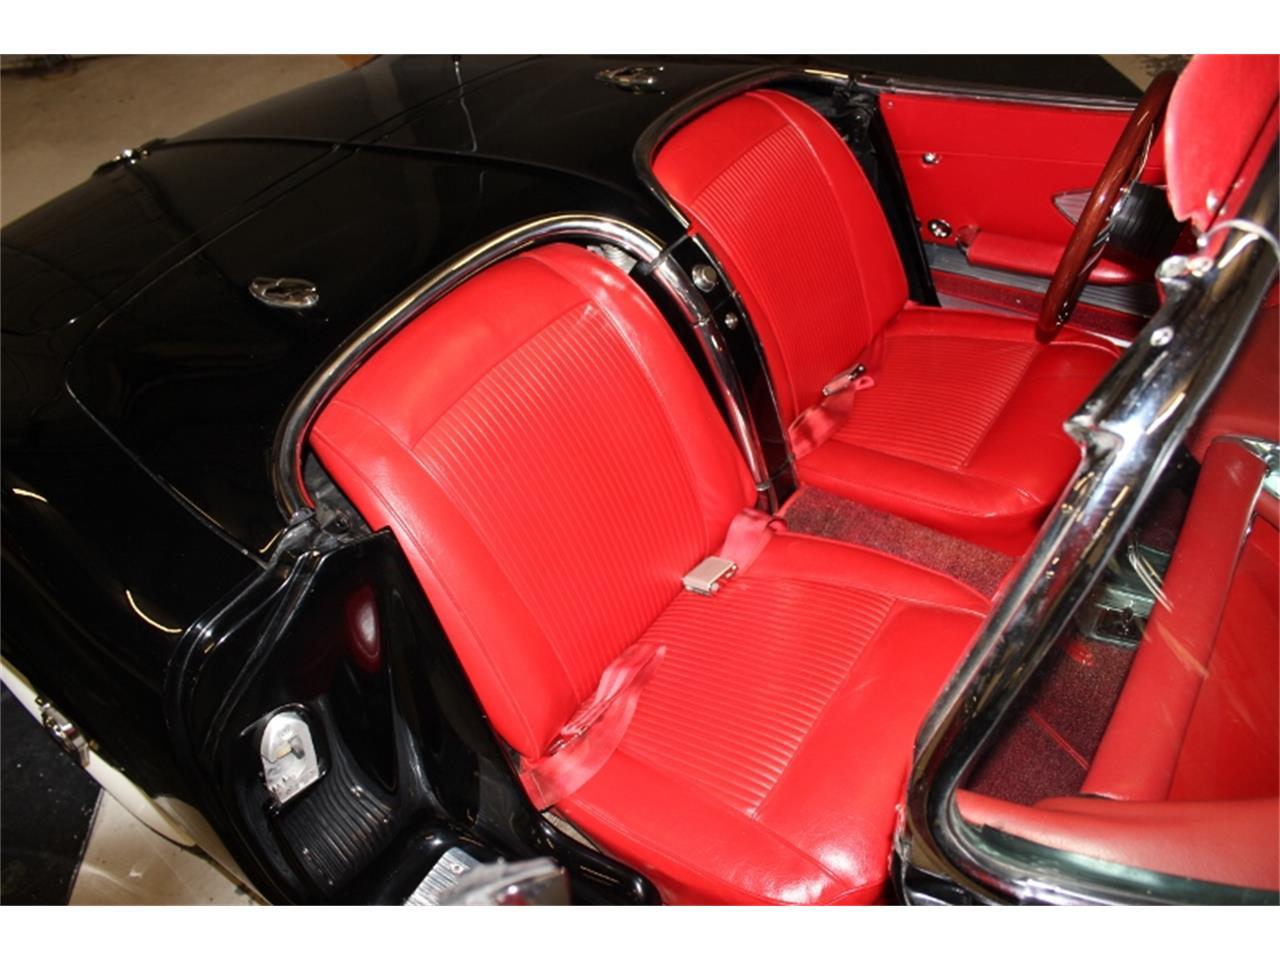 Large Picture of '61 Chevrolet Corvette - $90,000.00 - KT5Z